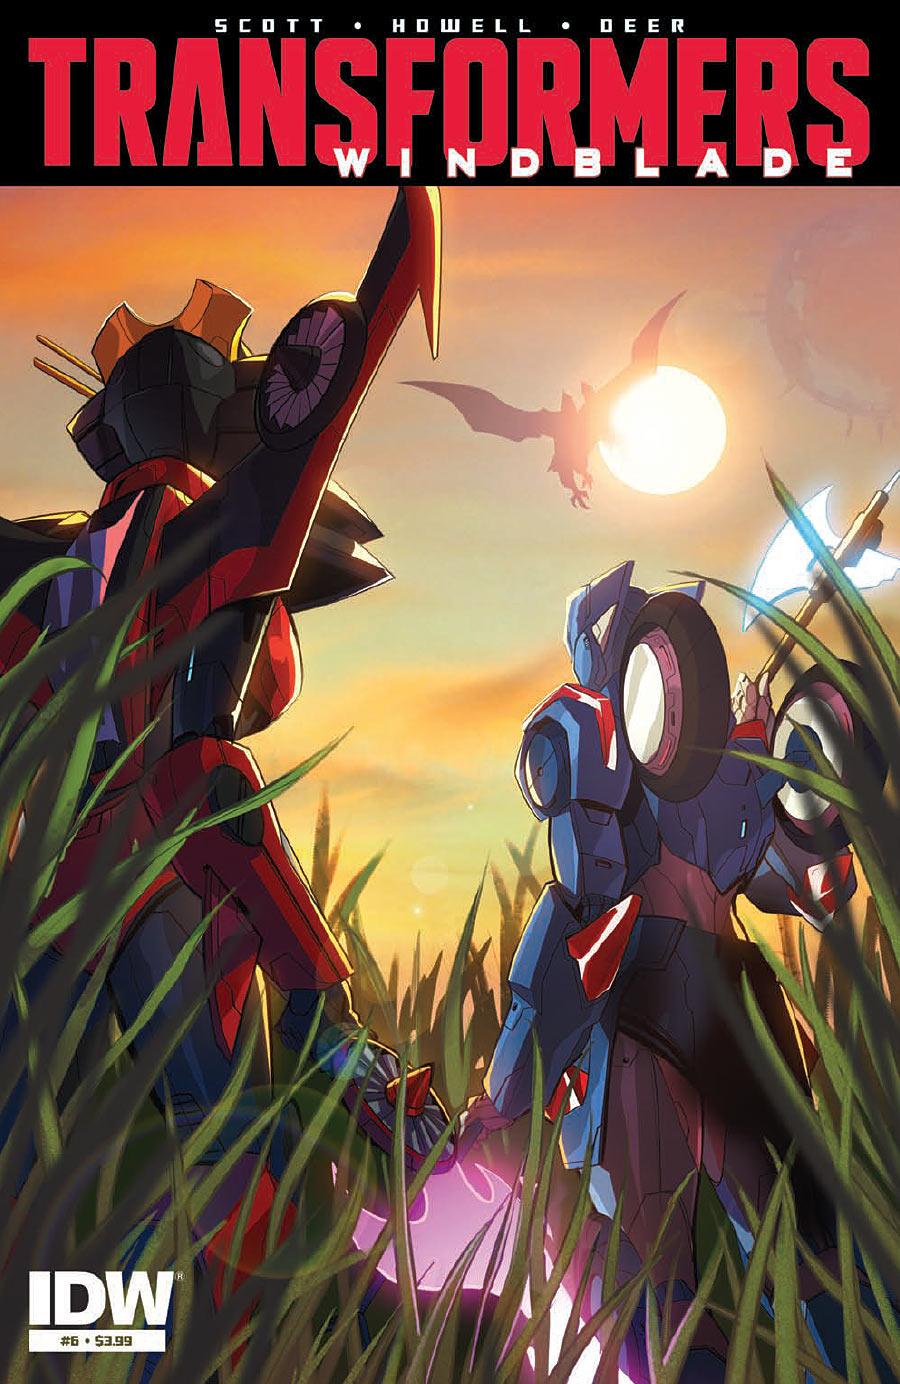 The Transformers: Windblade #6